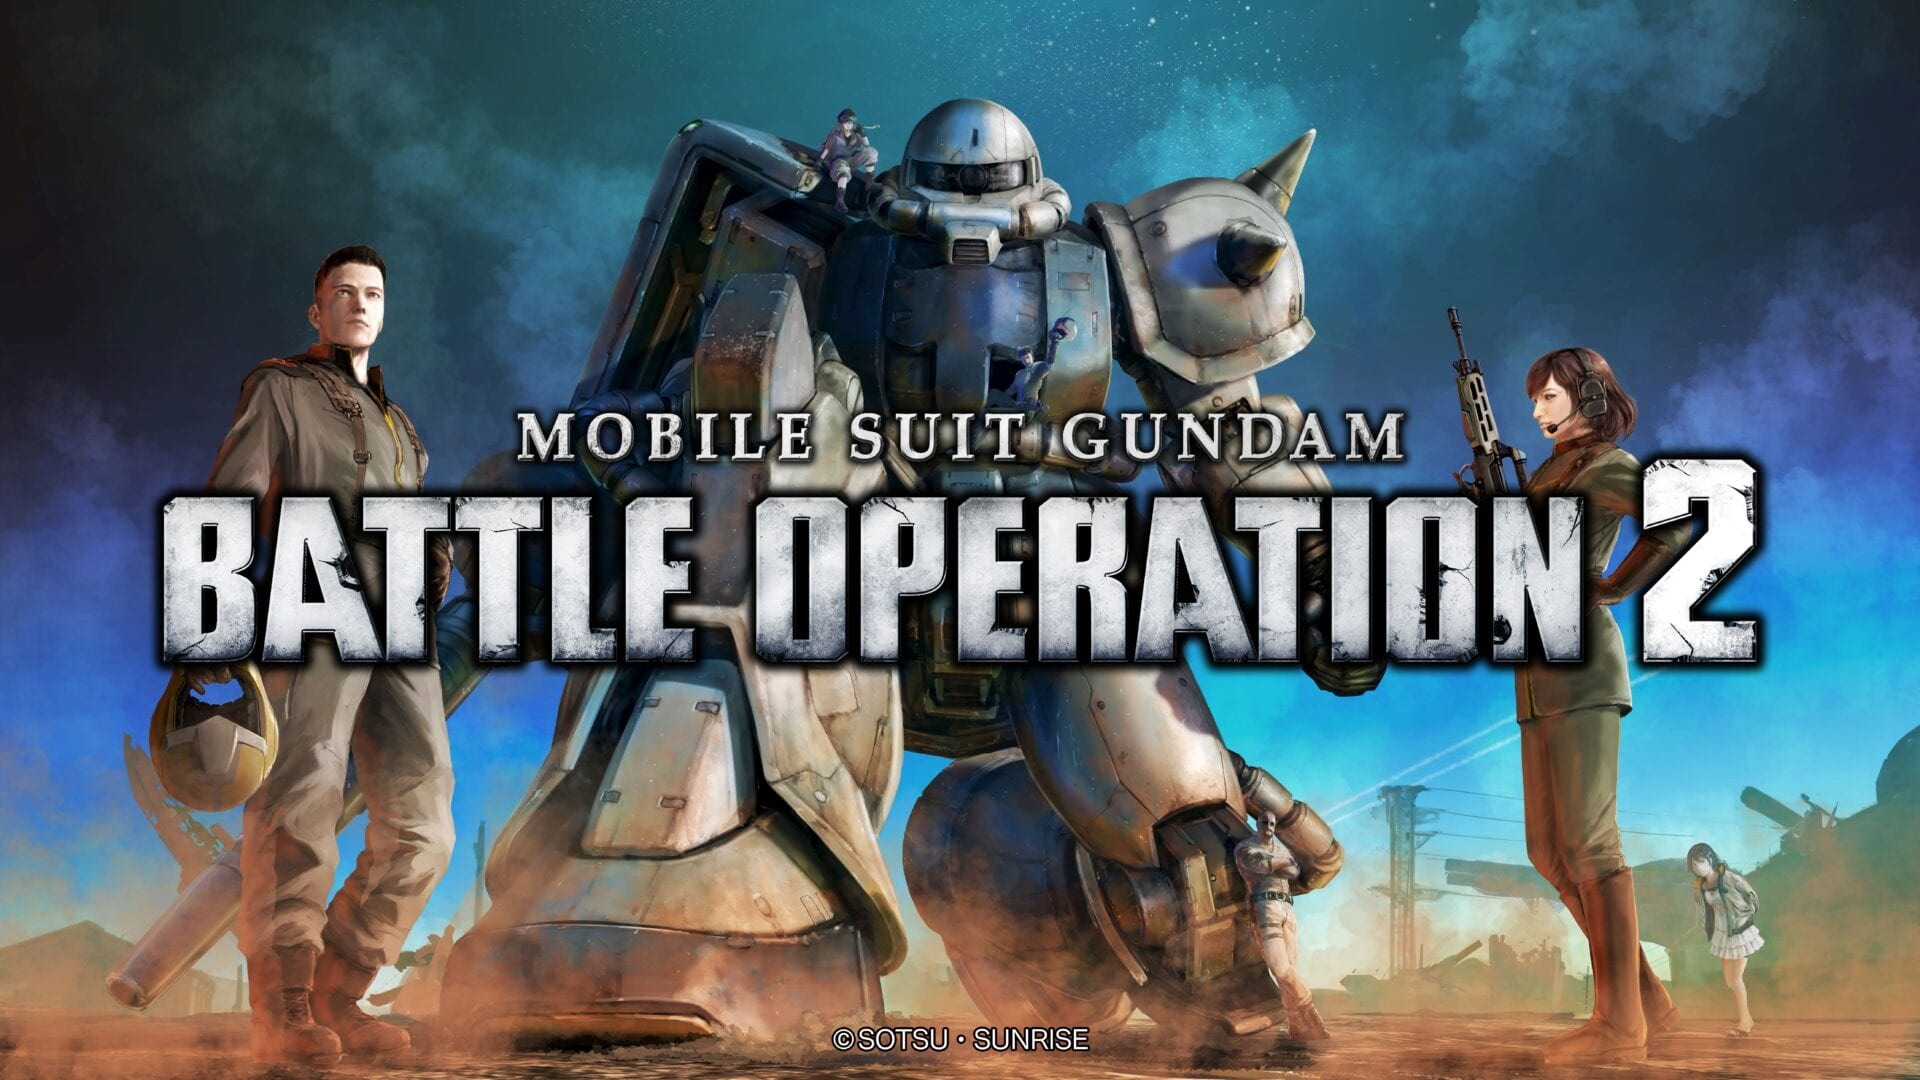 Mobile Suit Gundam Battle Opeation 2 PS5